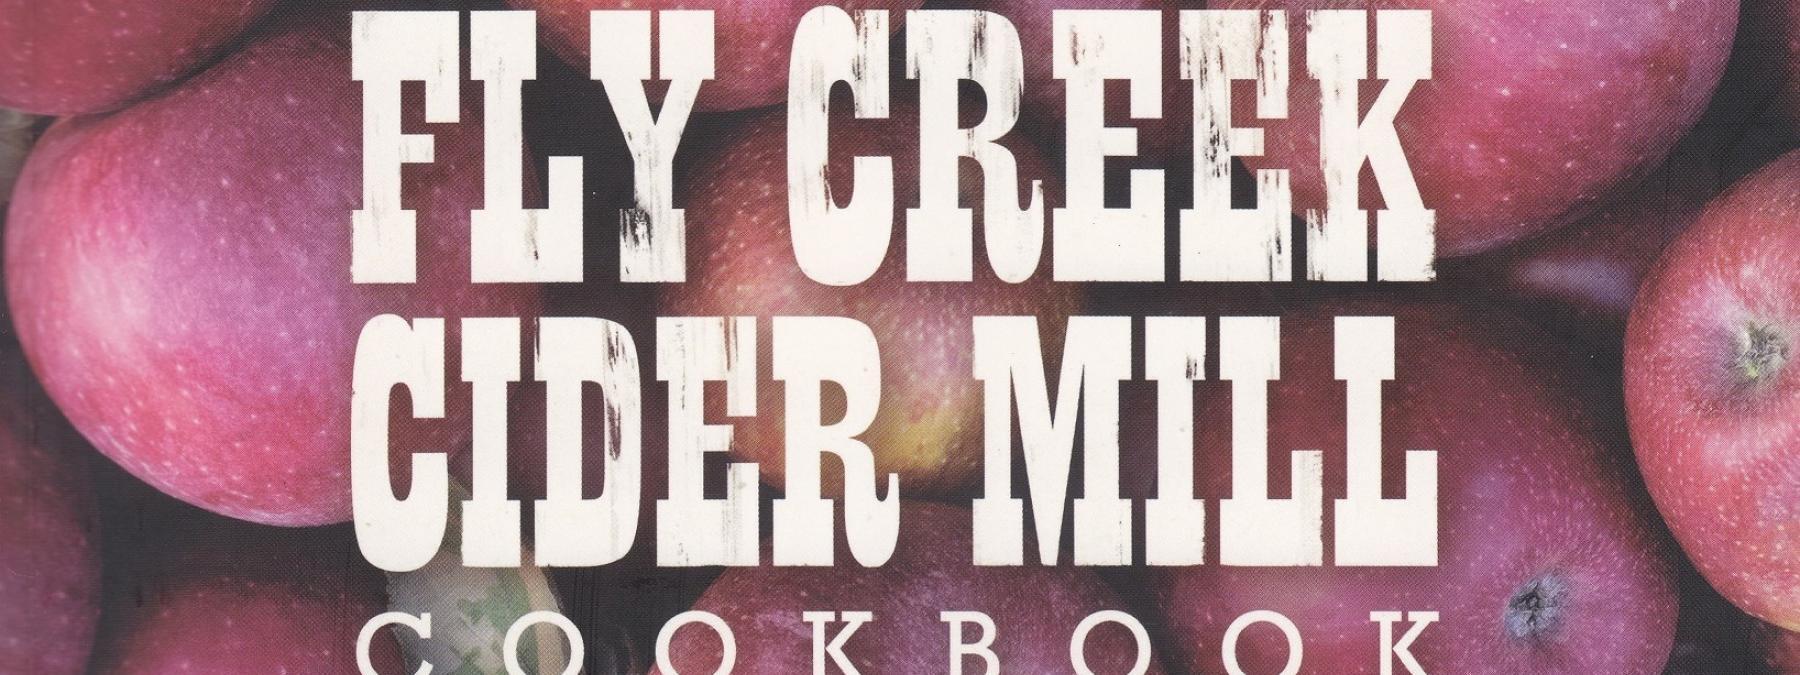 Fly Creek Cider Mill Cookbook